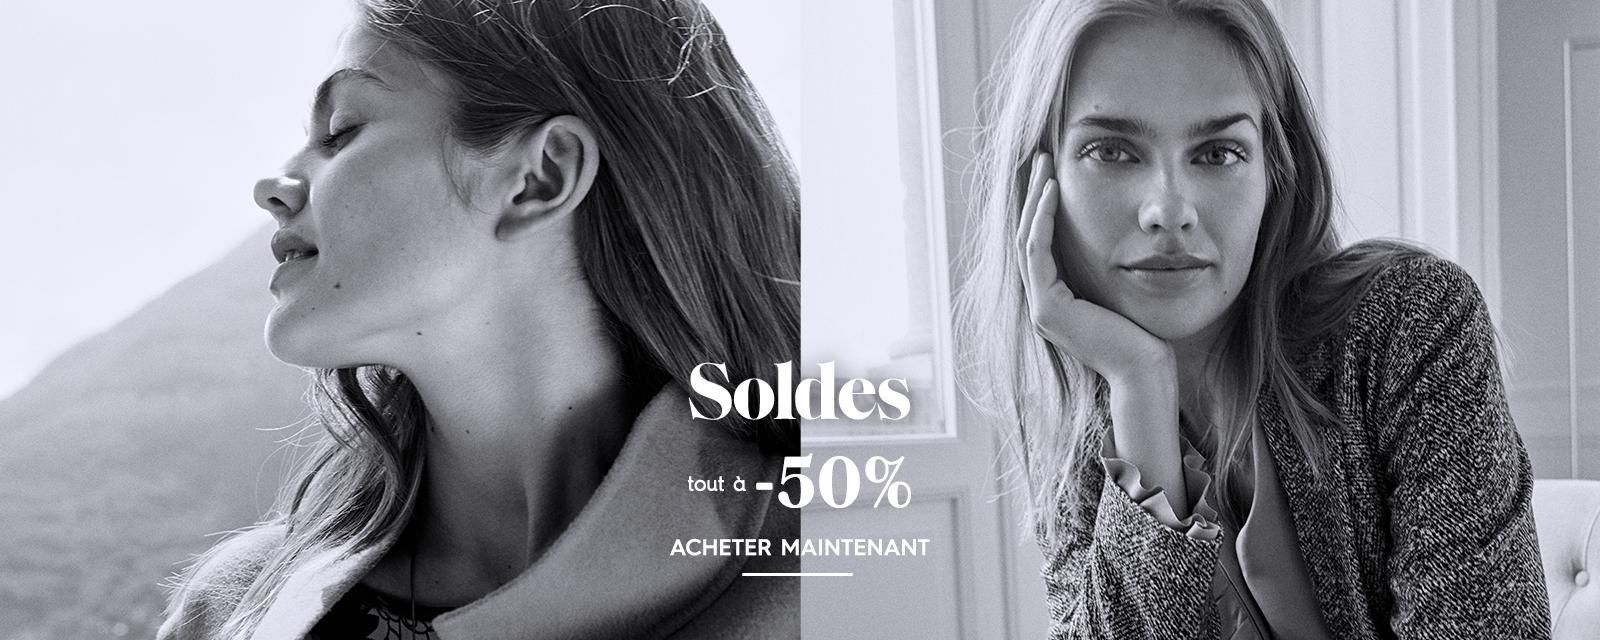 Elena Mirò Soldes: tout à -50%